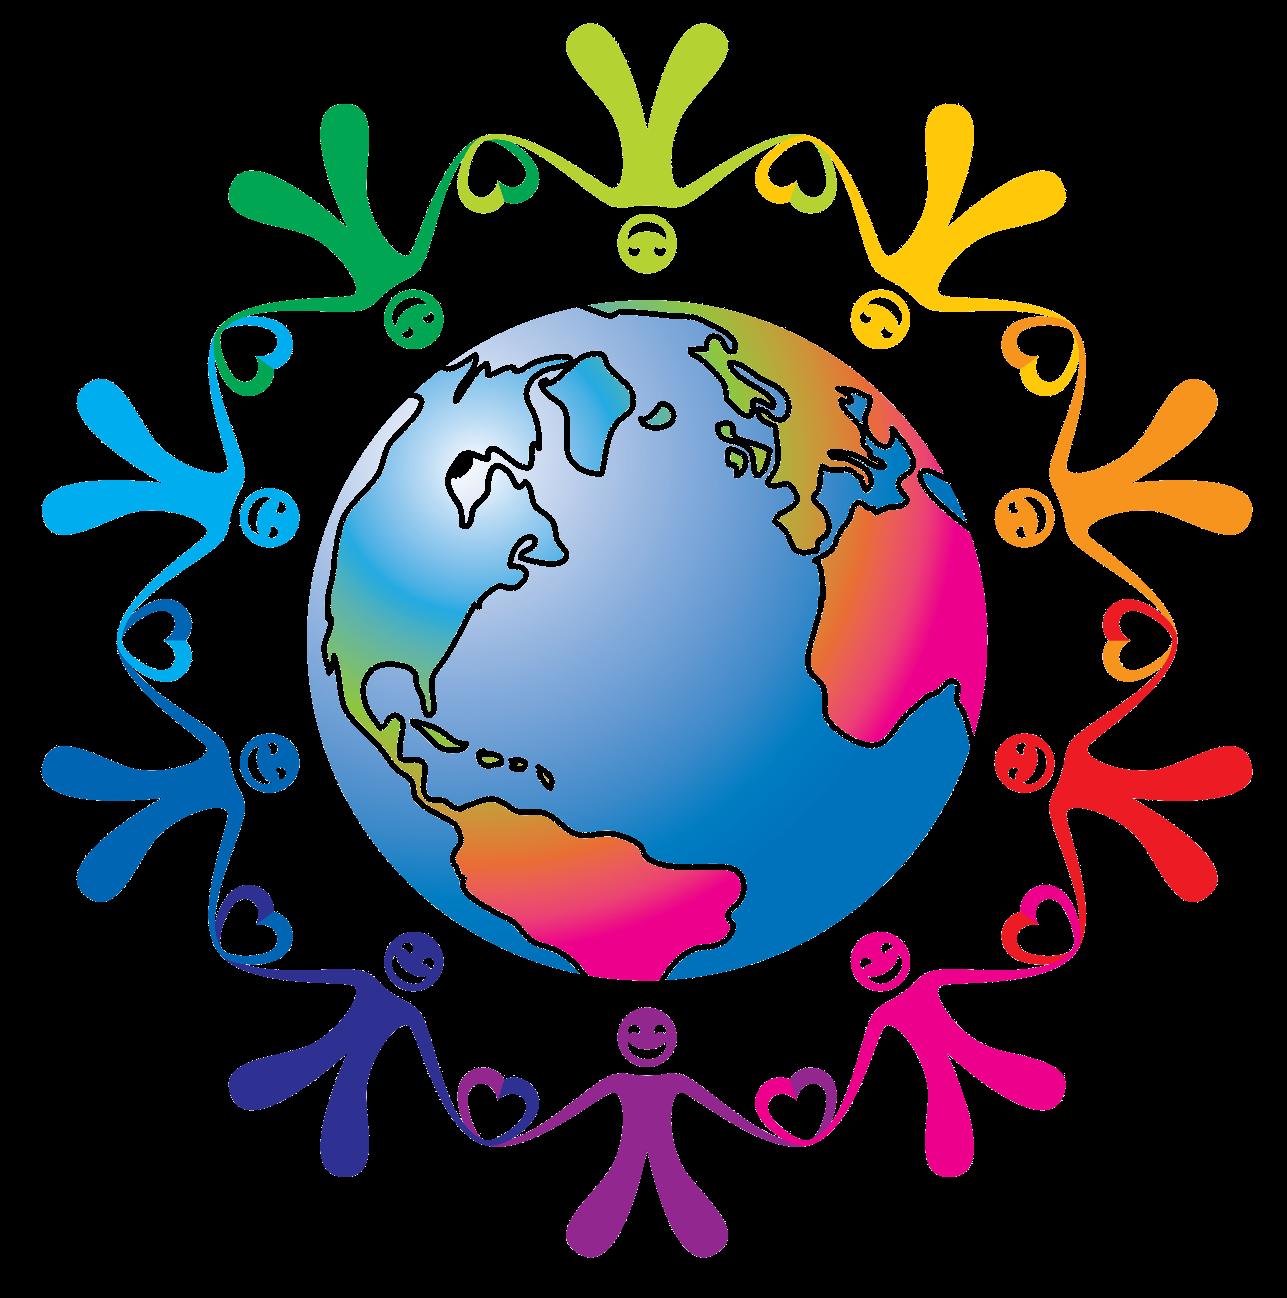 Changing Phase European Day Of Languages EDoL Pinterest - Languages on earth